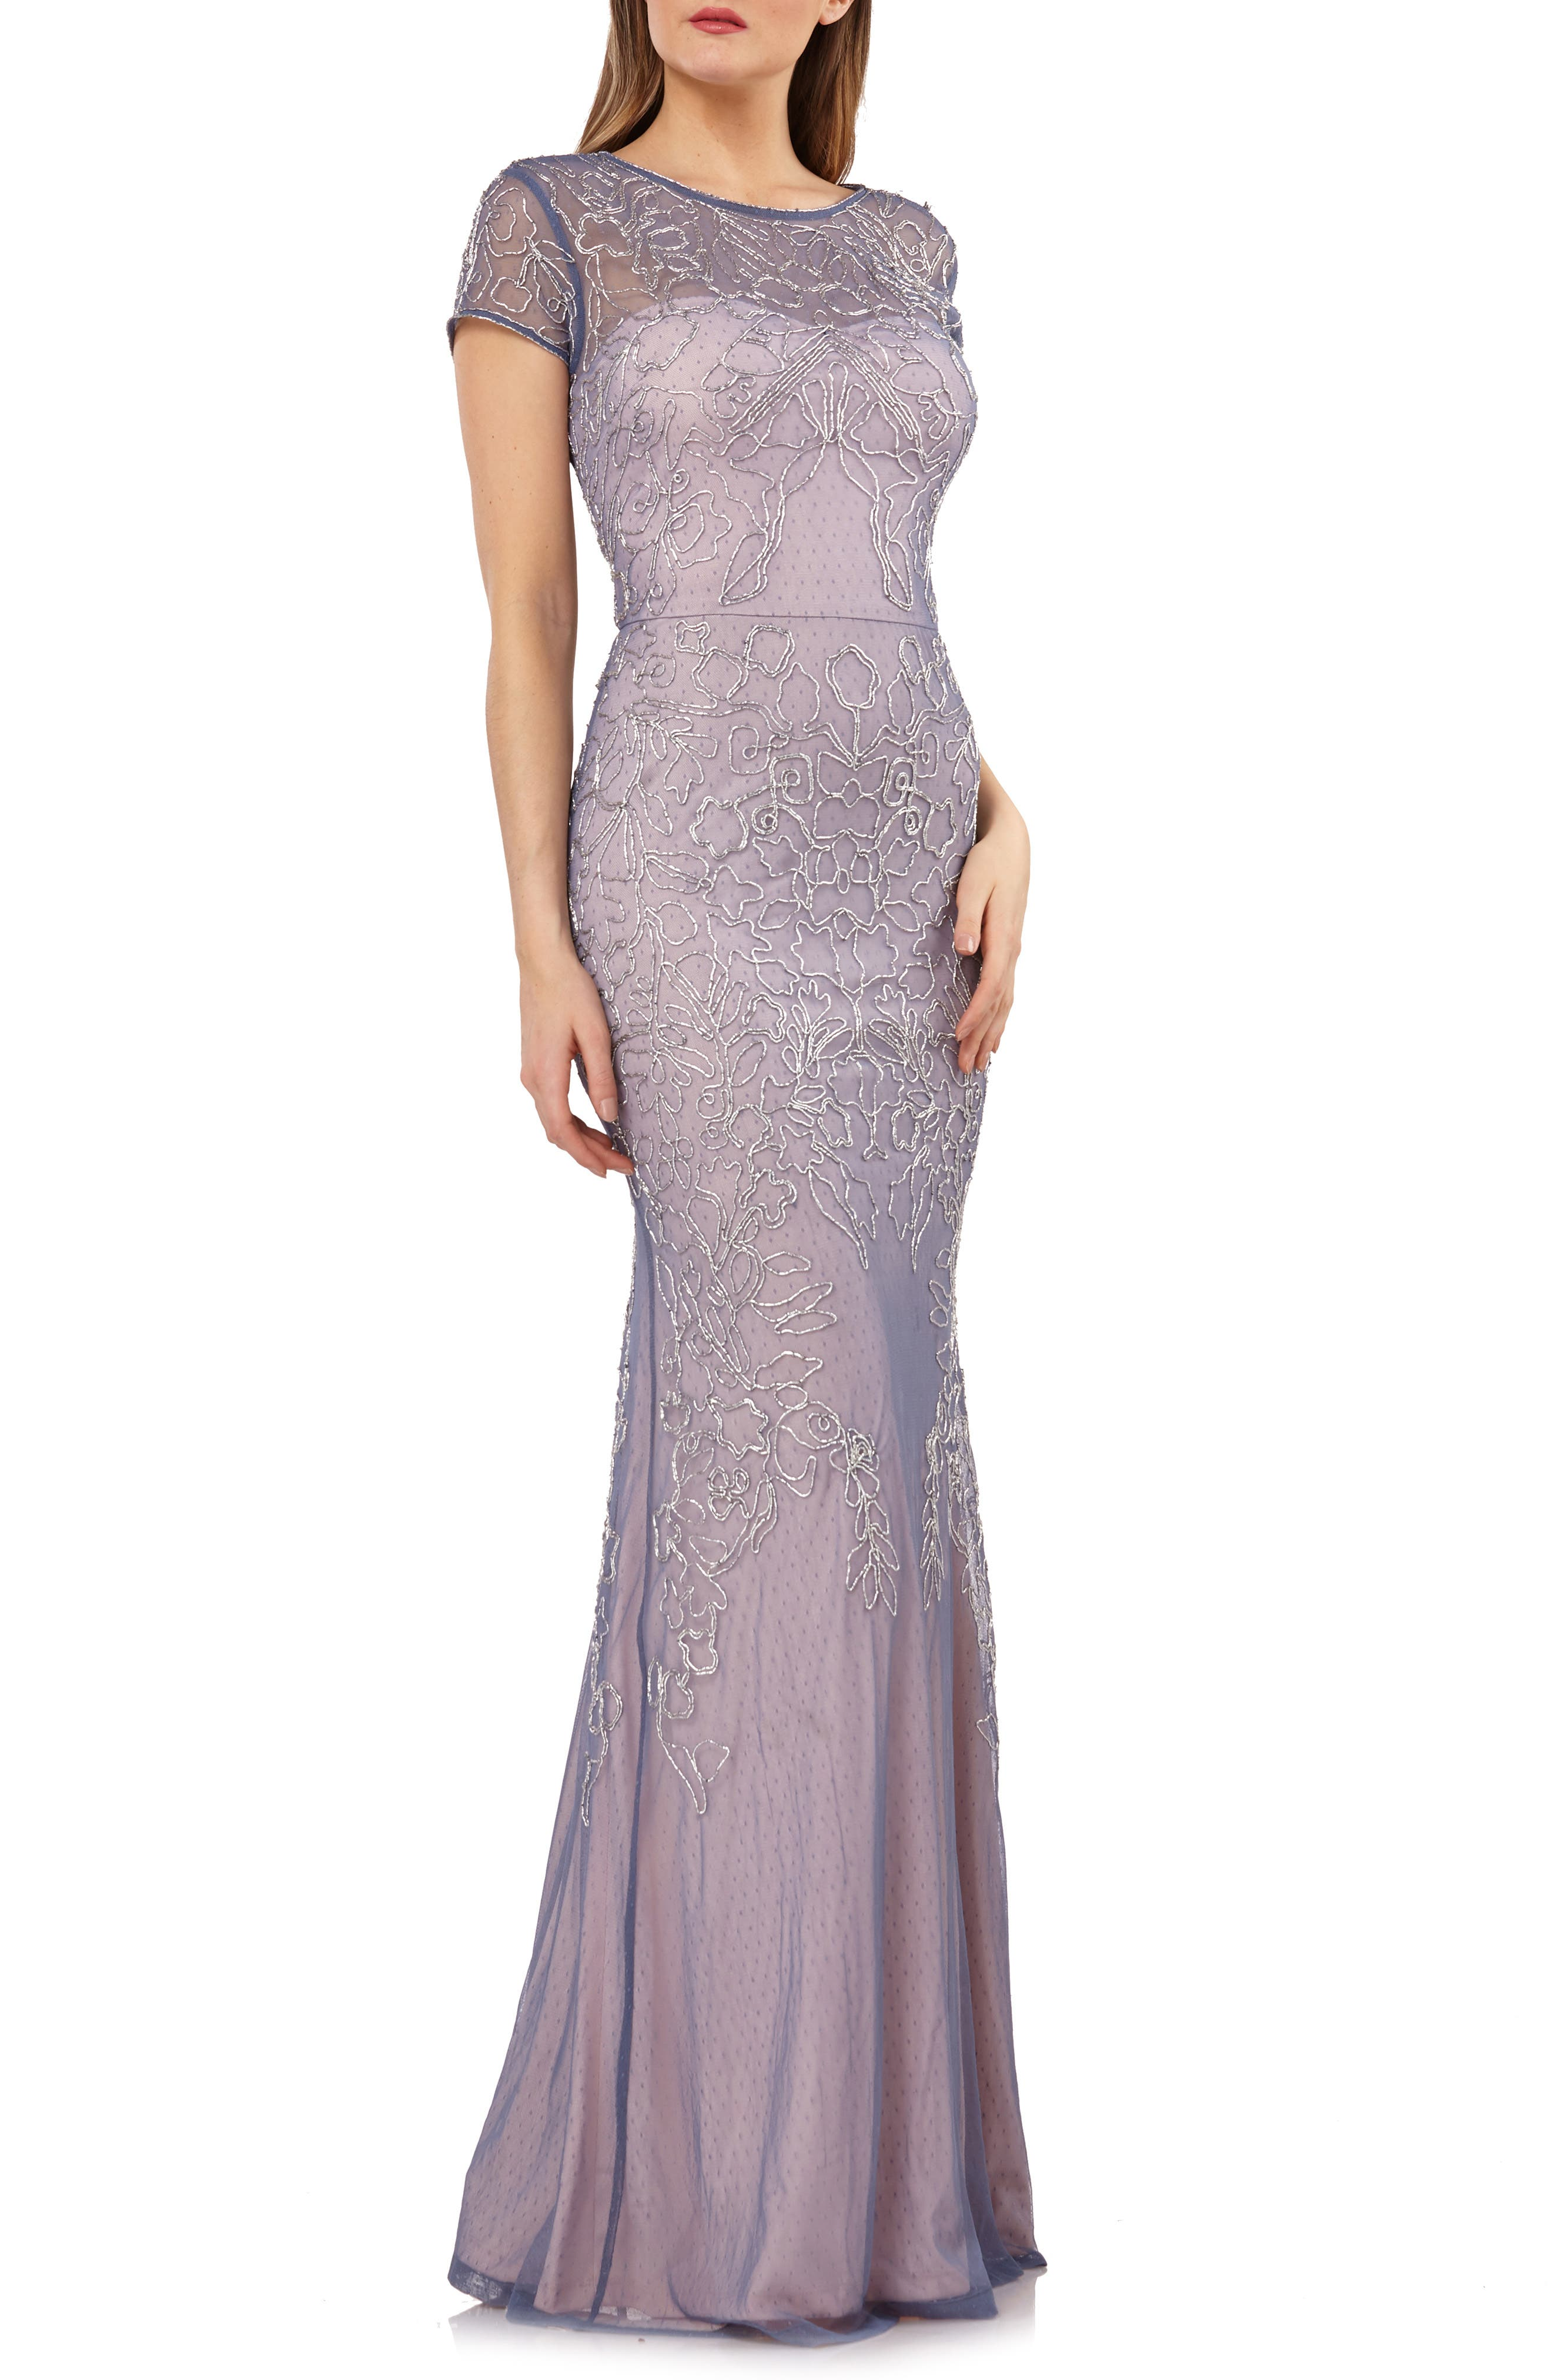 Vintage Evening Dresses and Formal Evening Gowns Womens Js Collections Soutache Mesh Evening Dress $358.00 AT vintagedancer.com